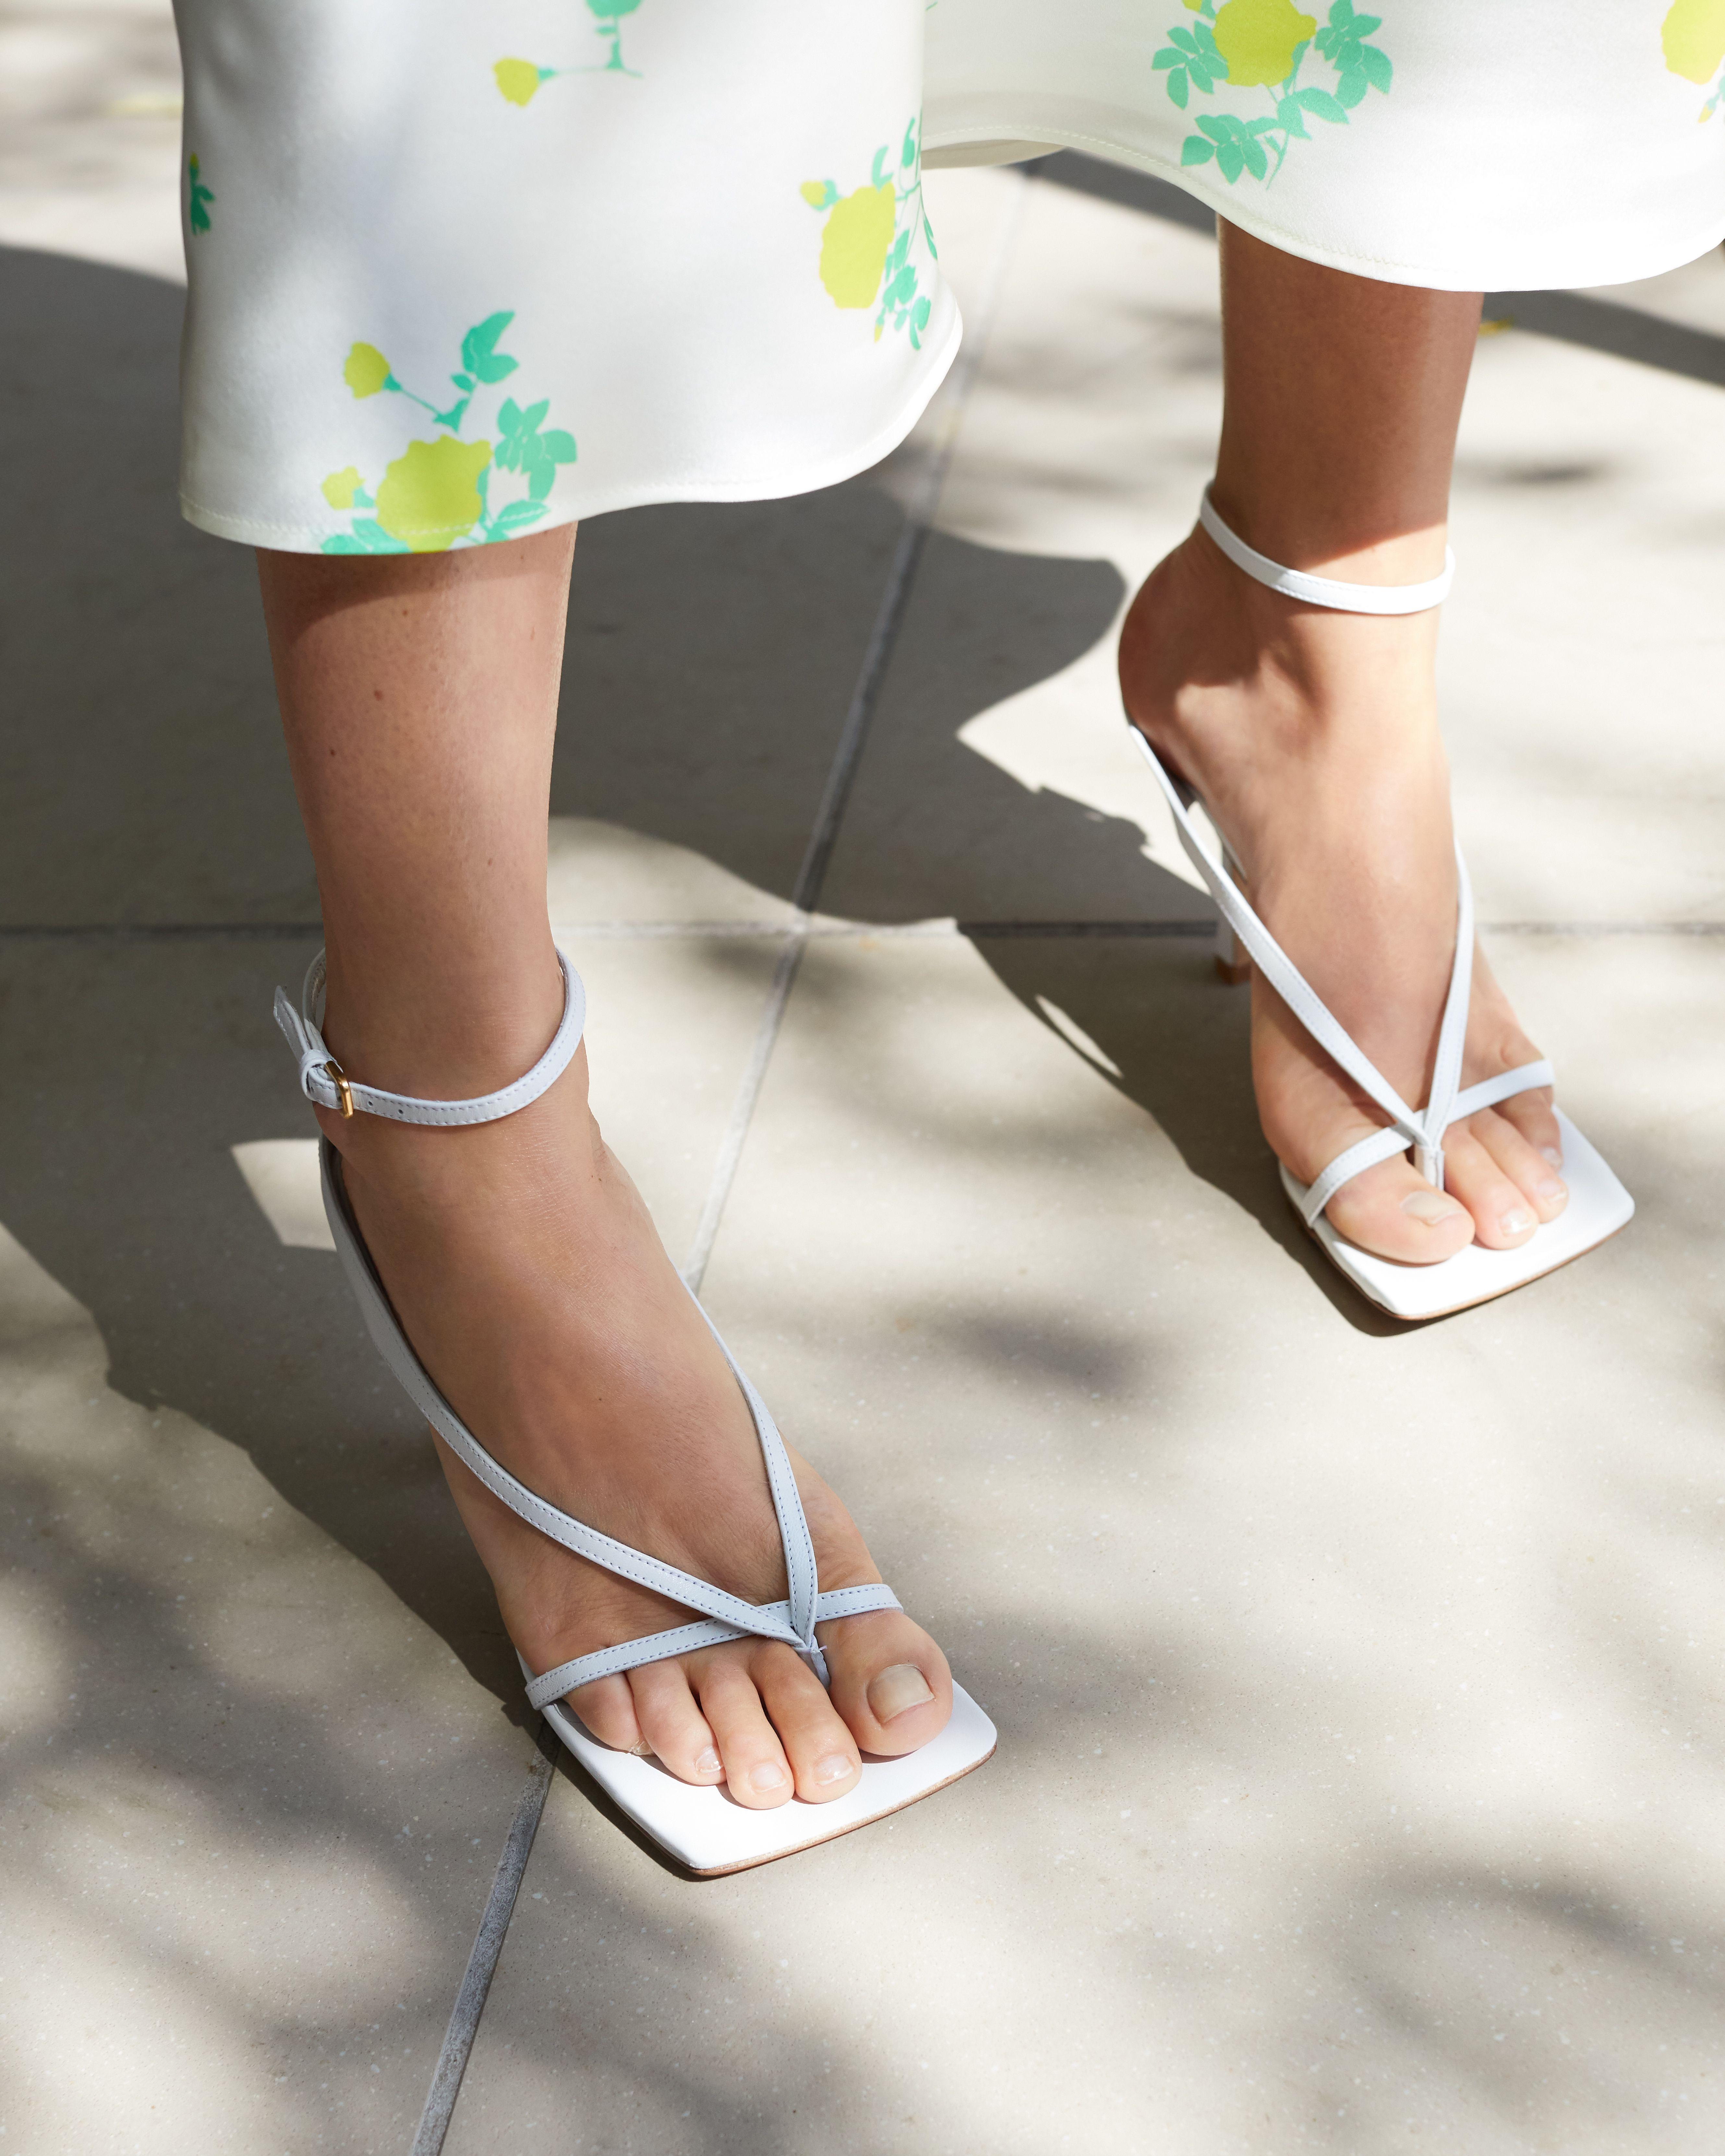 BOTTEGA VENETA Leather sandals is part of Shoes -